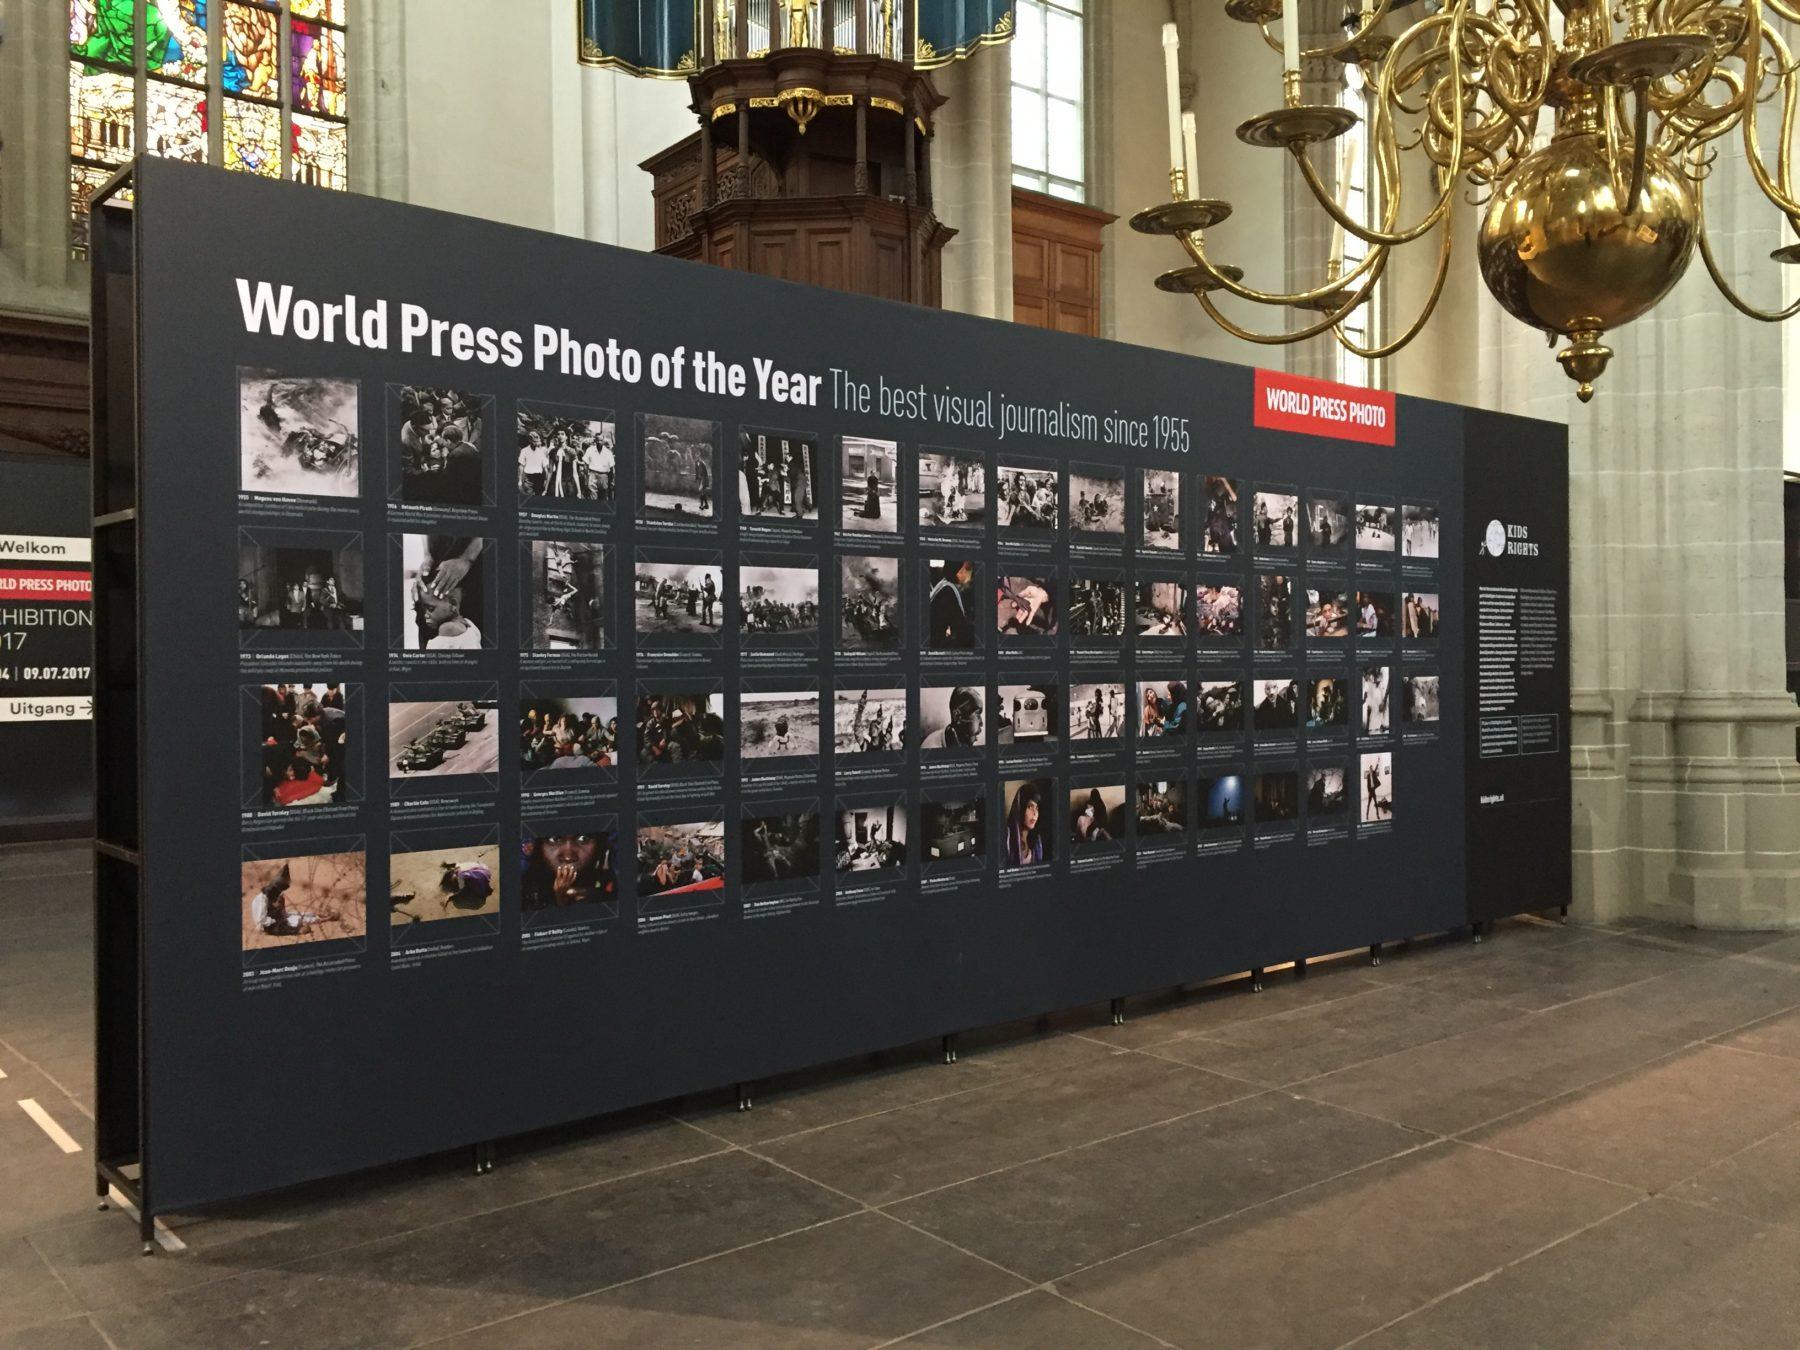 De Nieuwe Kerk, Amsterdam | World Press Photo tentoonstelling